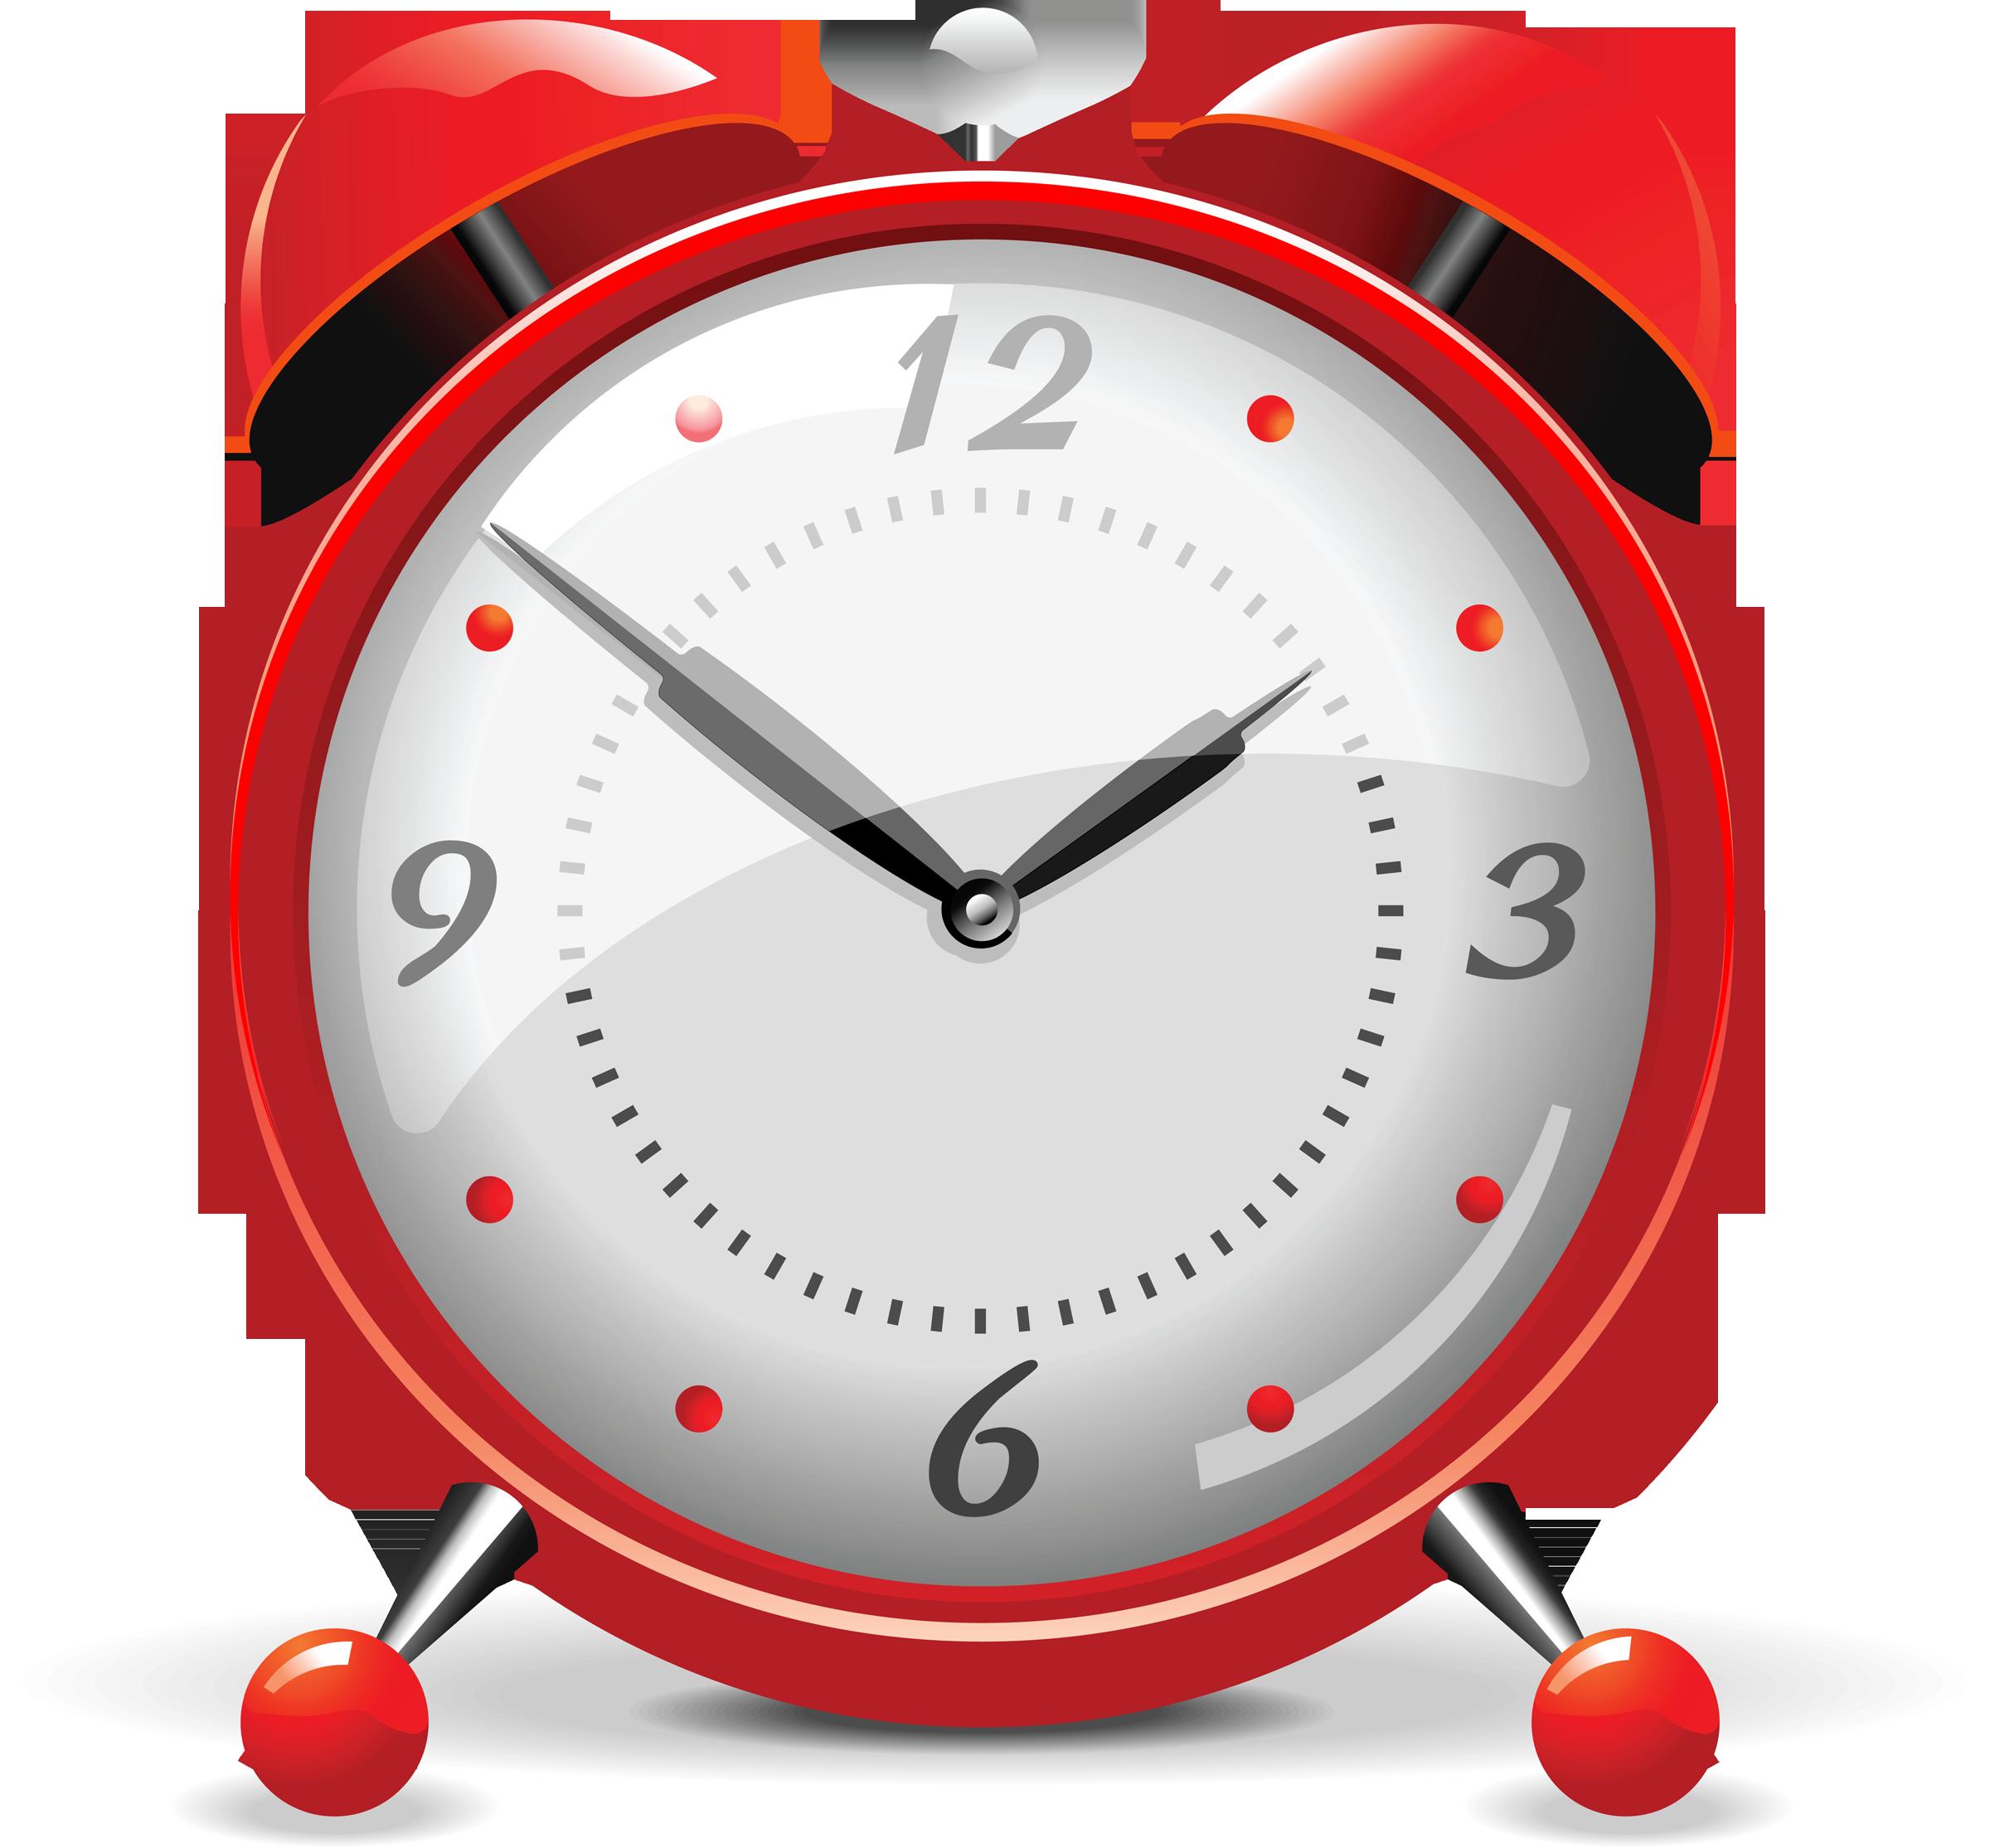 Clock Clipart Transparent 15141 Transparentpng